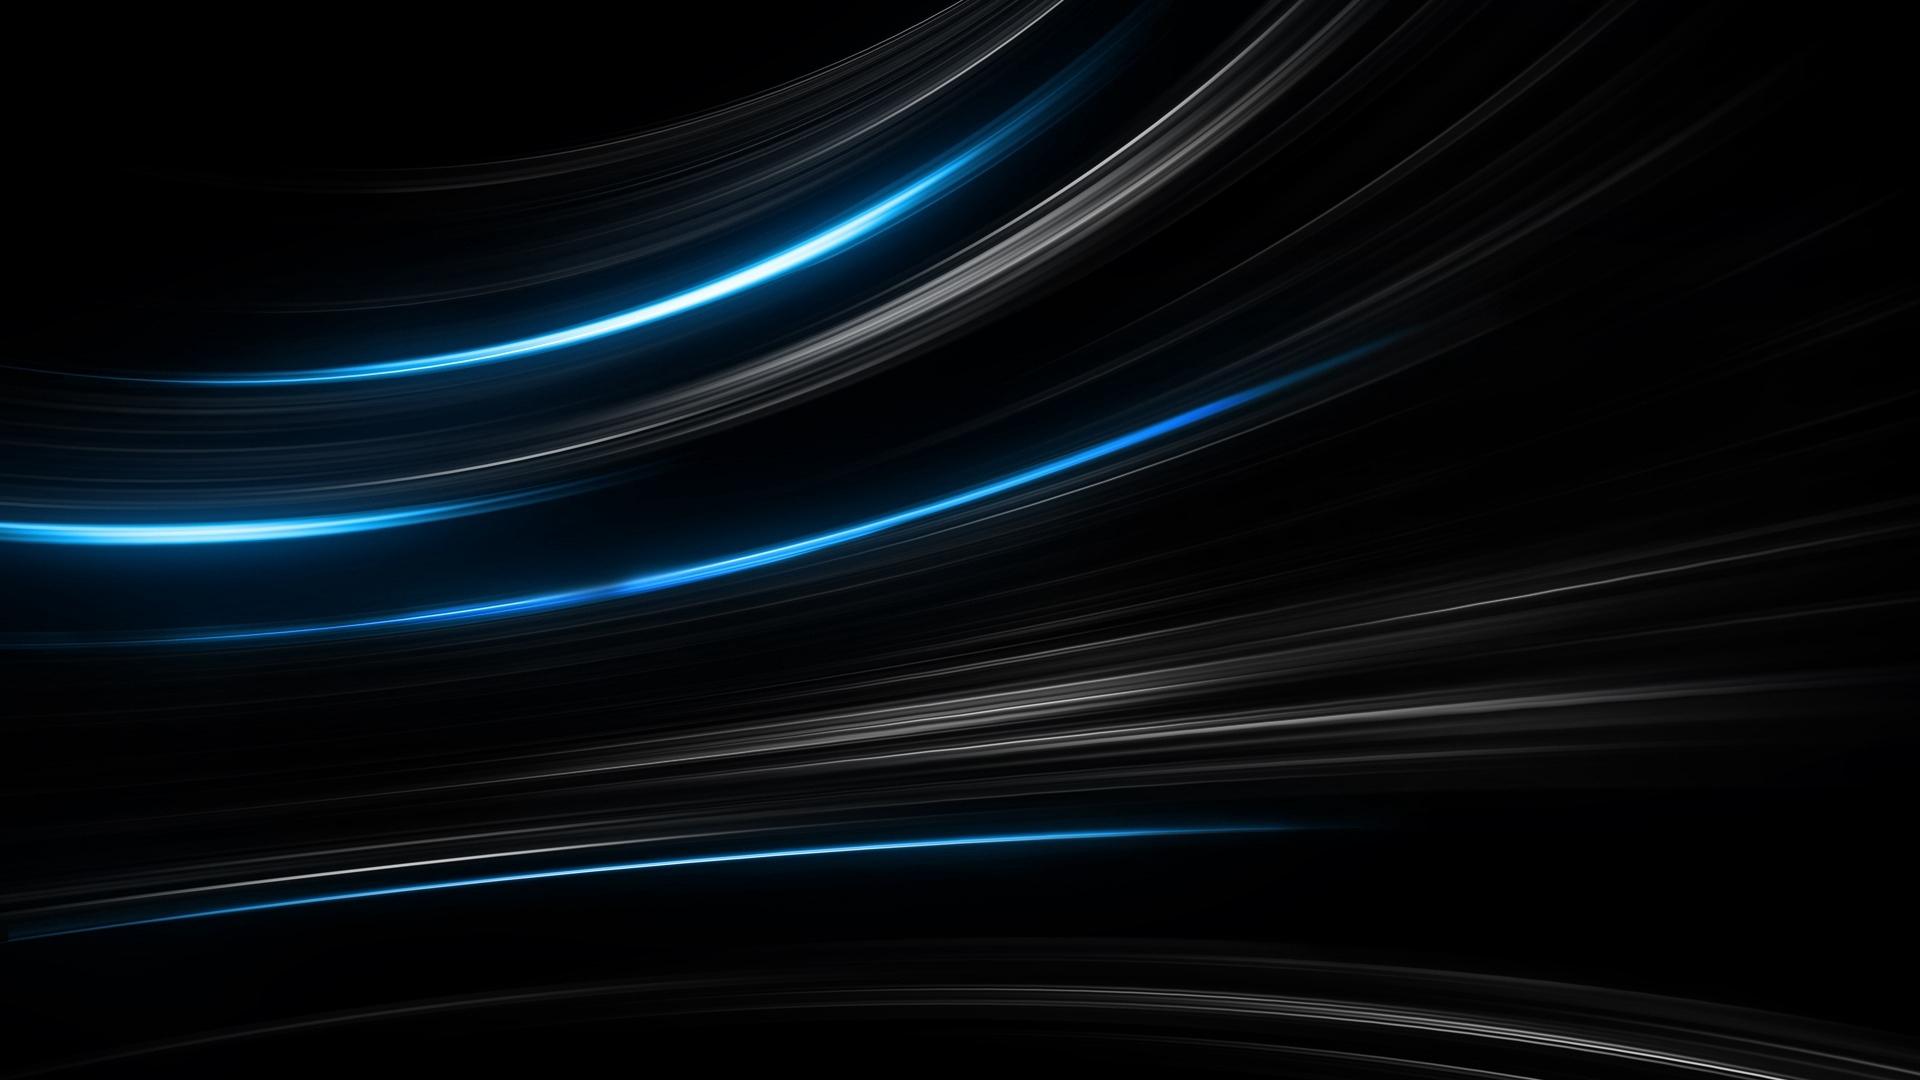 Black Abstract 1080p wallpaper